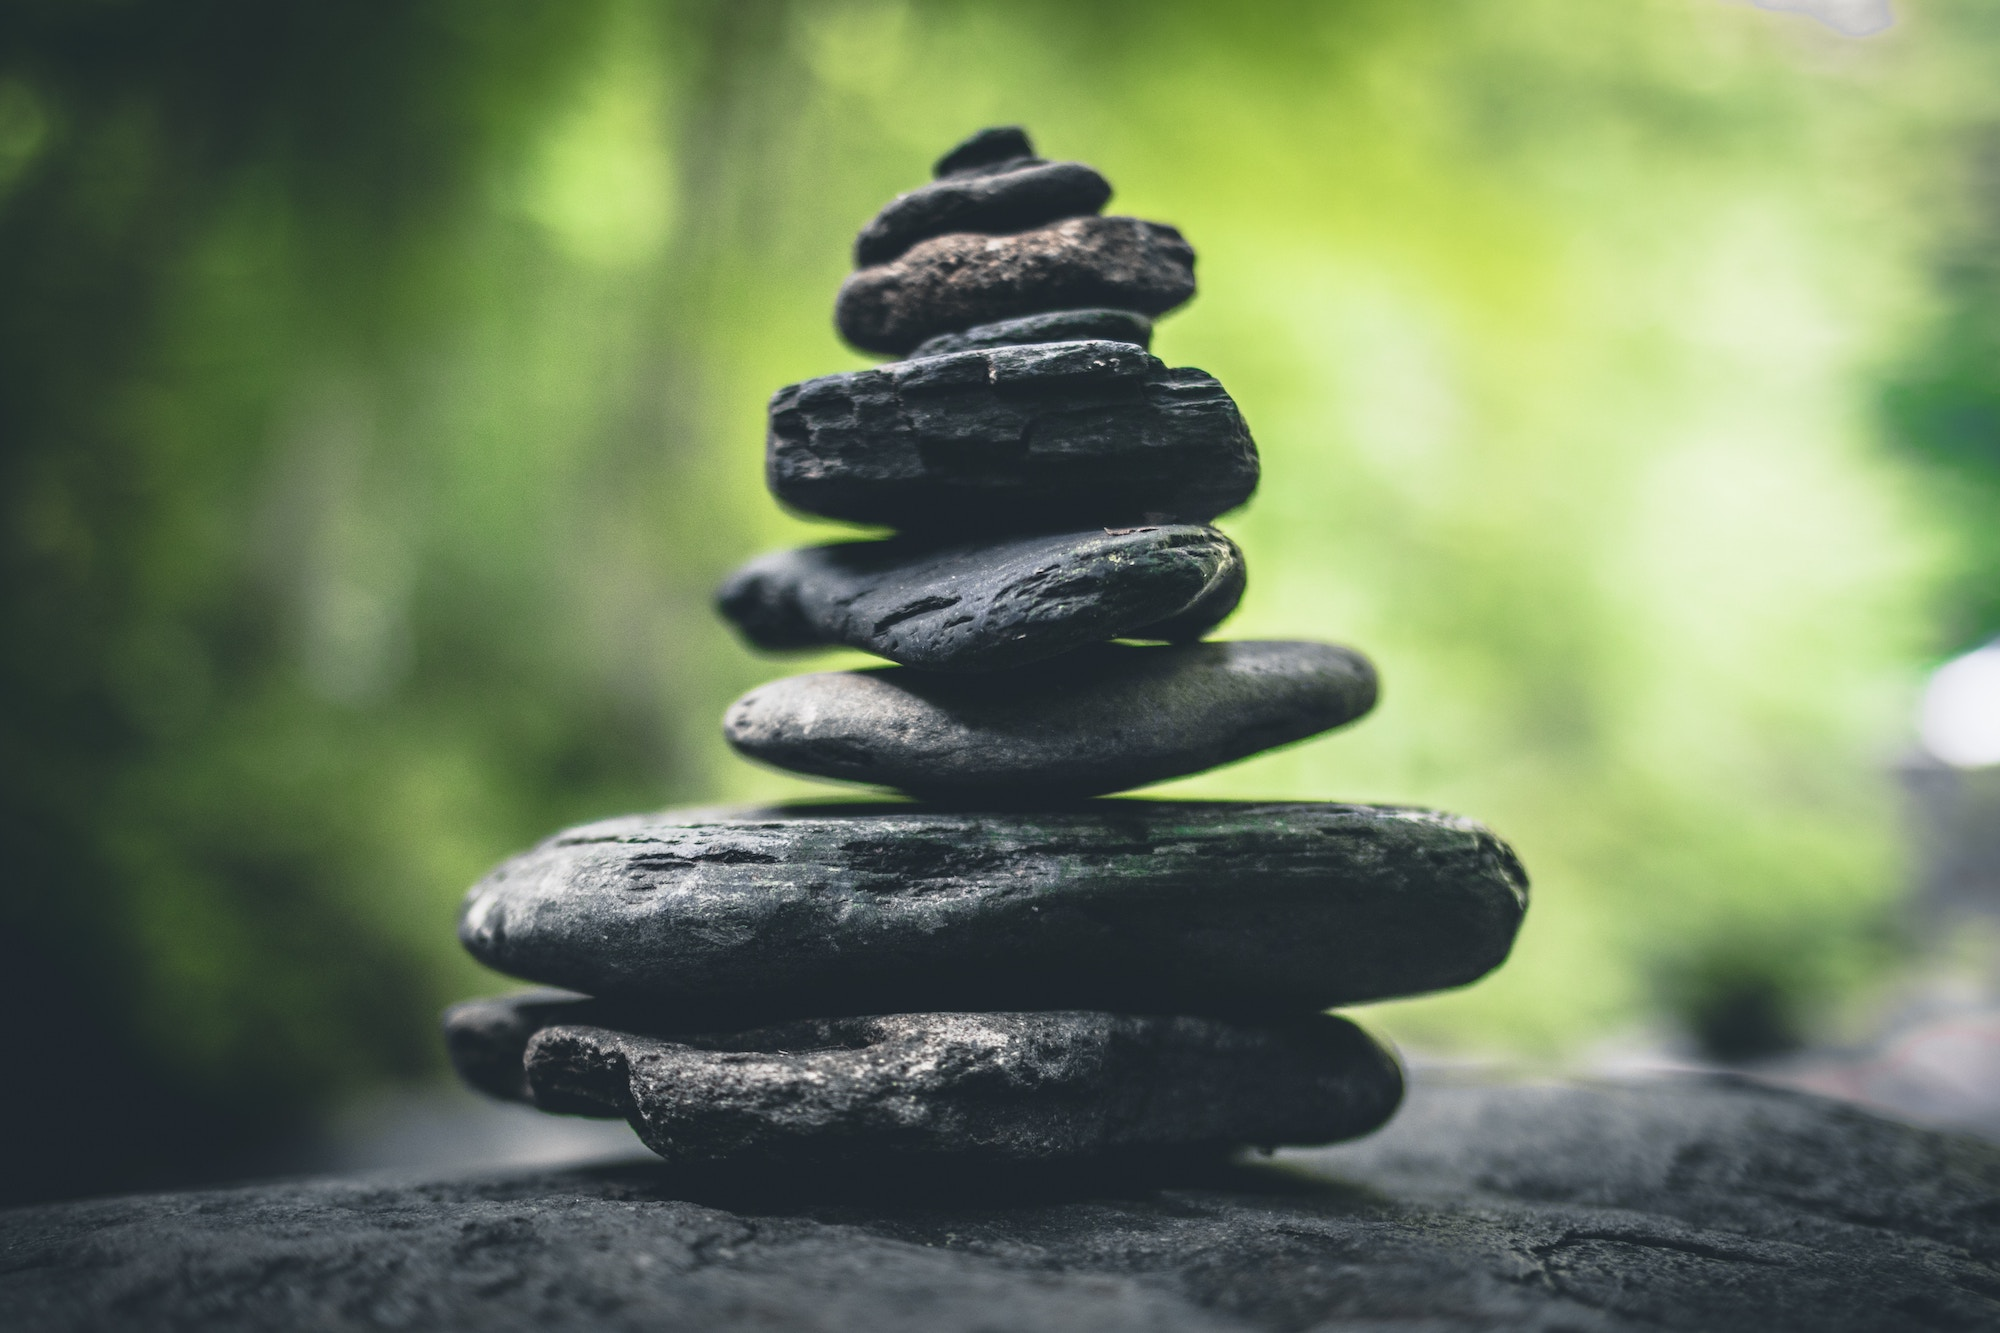 stone-pile-zen.jpg